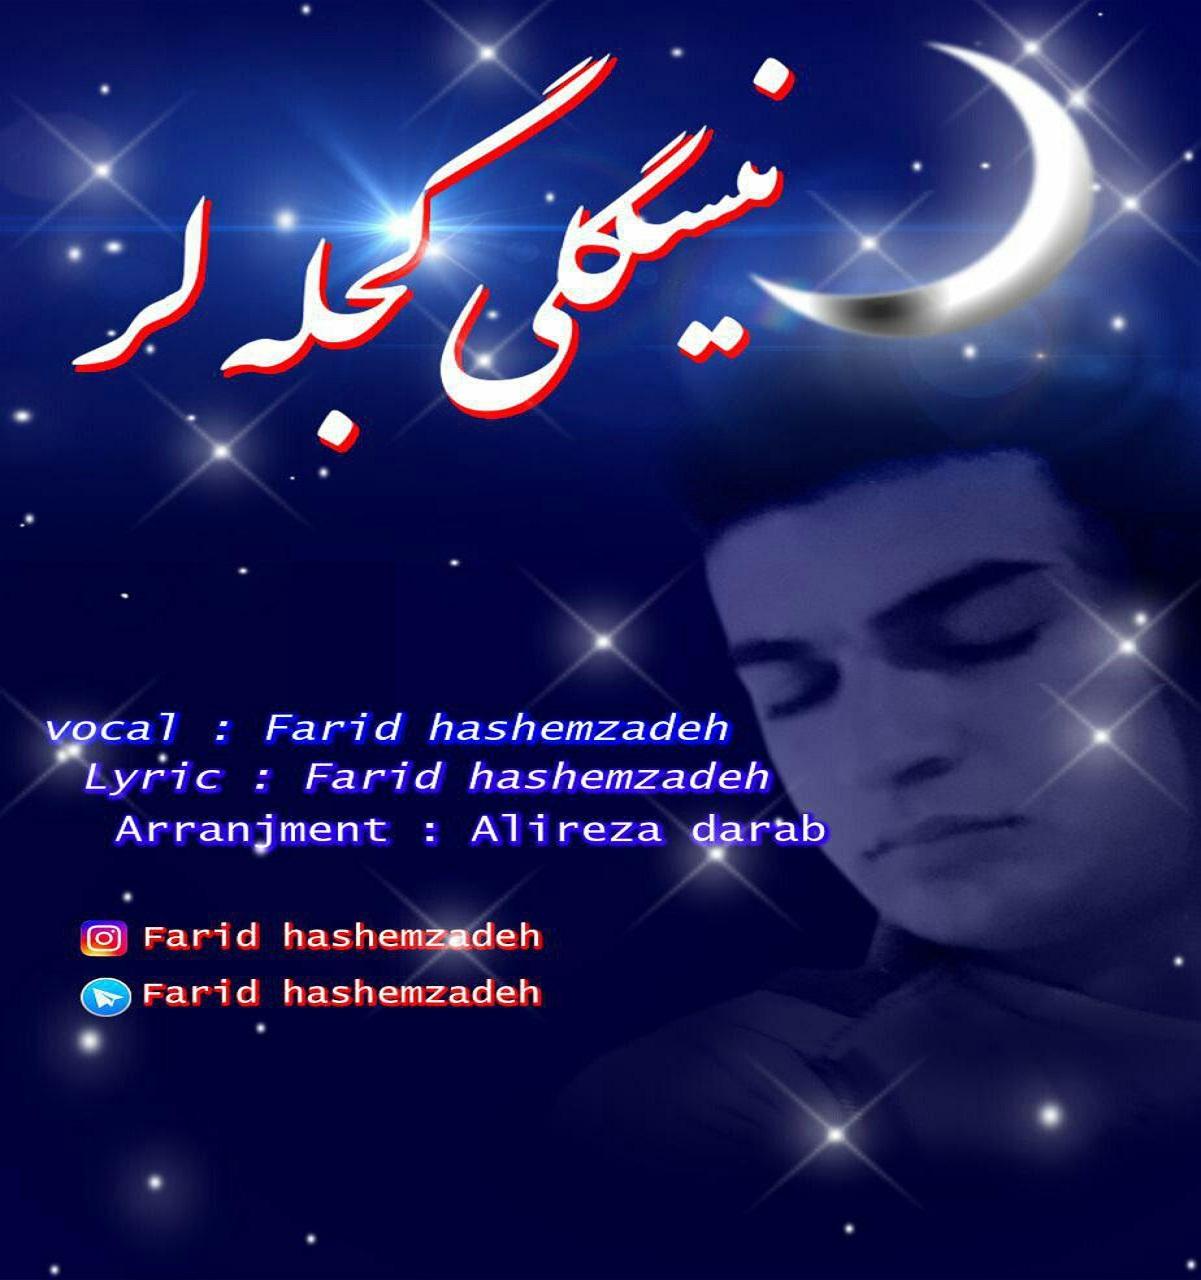 http://s8.picofile.com/file/8308788550/04Farid_Hashemzadeh_Niskilli_Gejalar.jpg